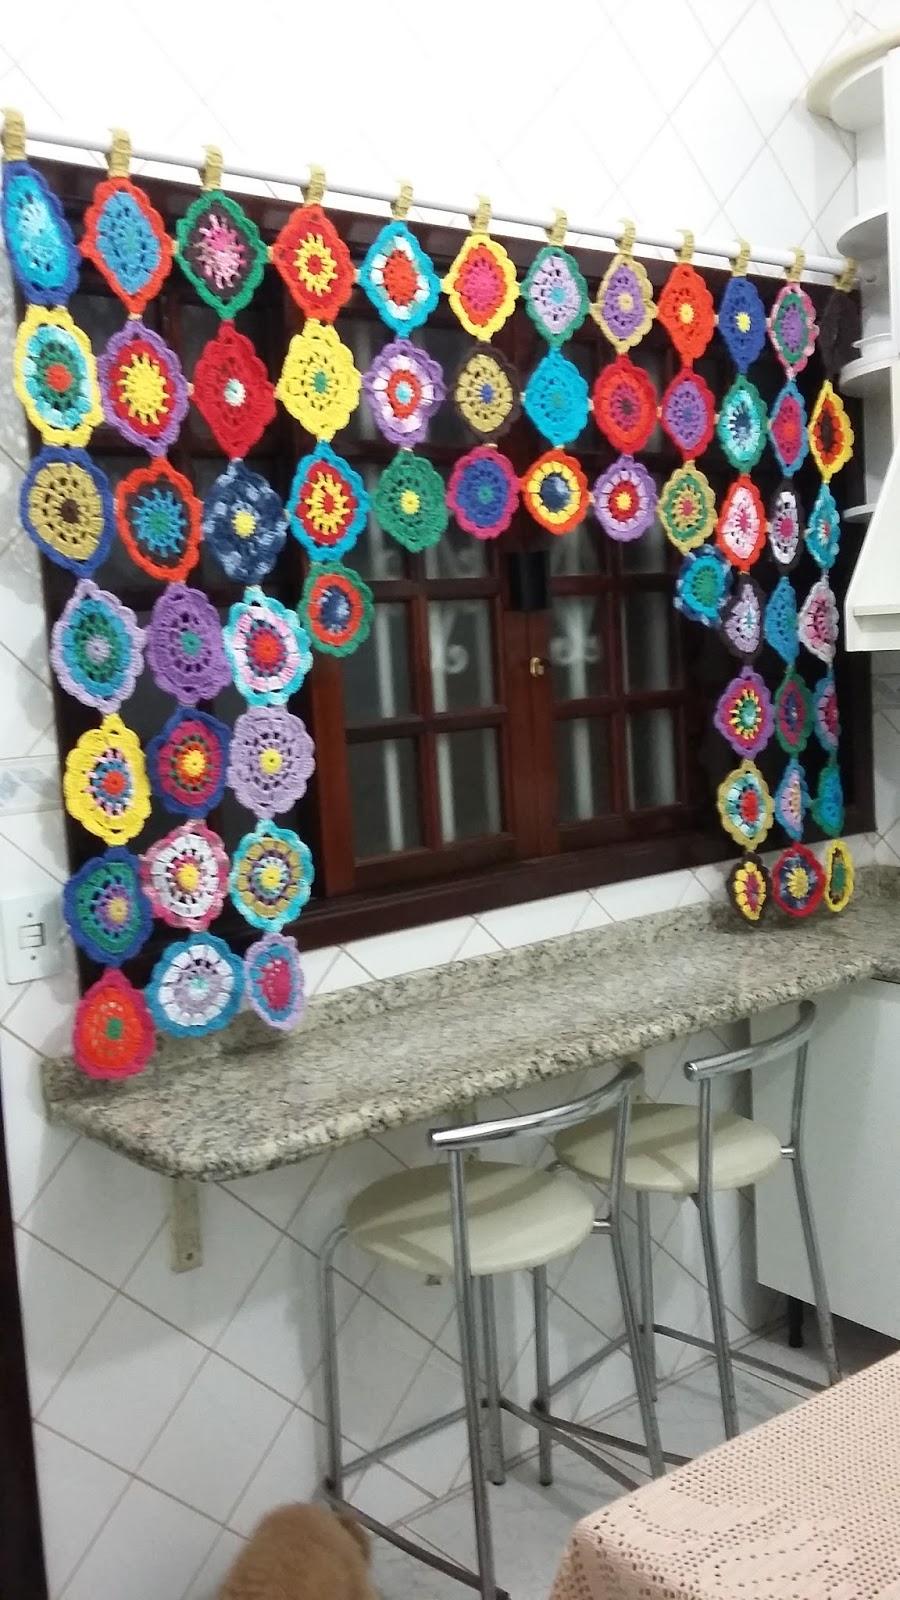 Adesivo Olhinhos Fechados ~ Coisas da Musky Artesanato Cortinas Cortina de croch u00ea Barbante Barroco Cozinha